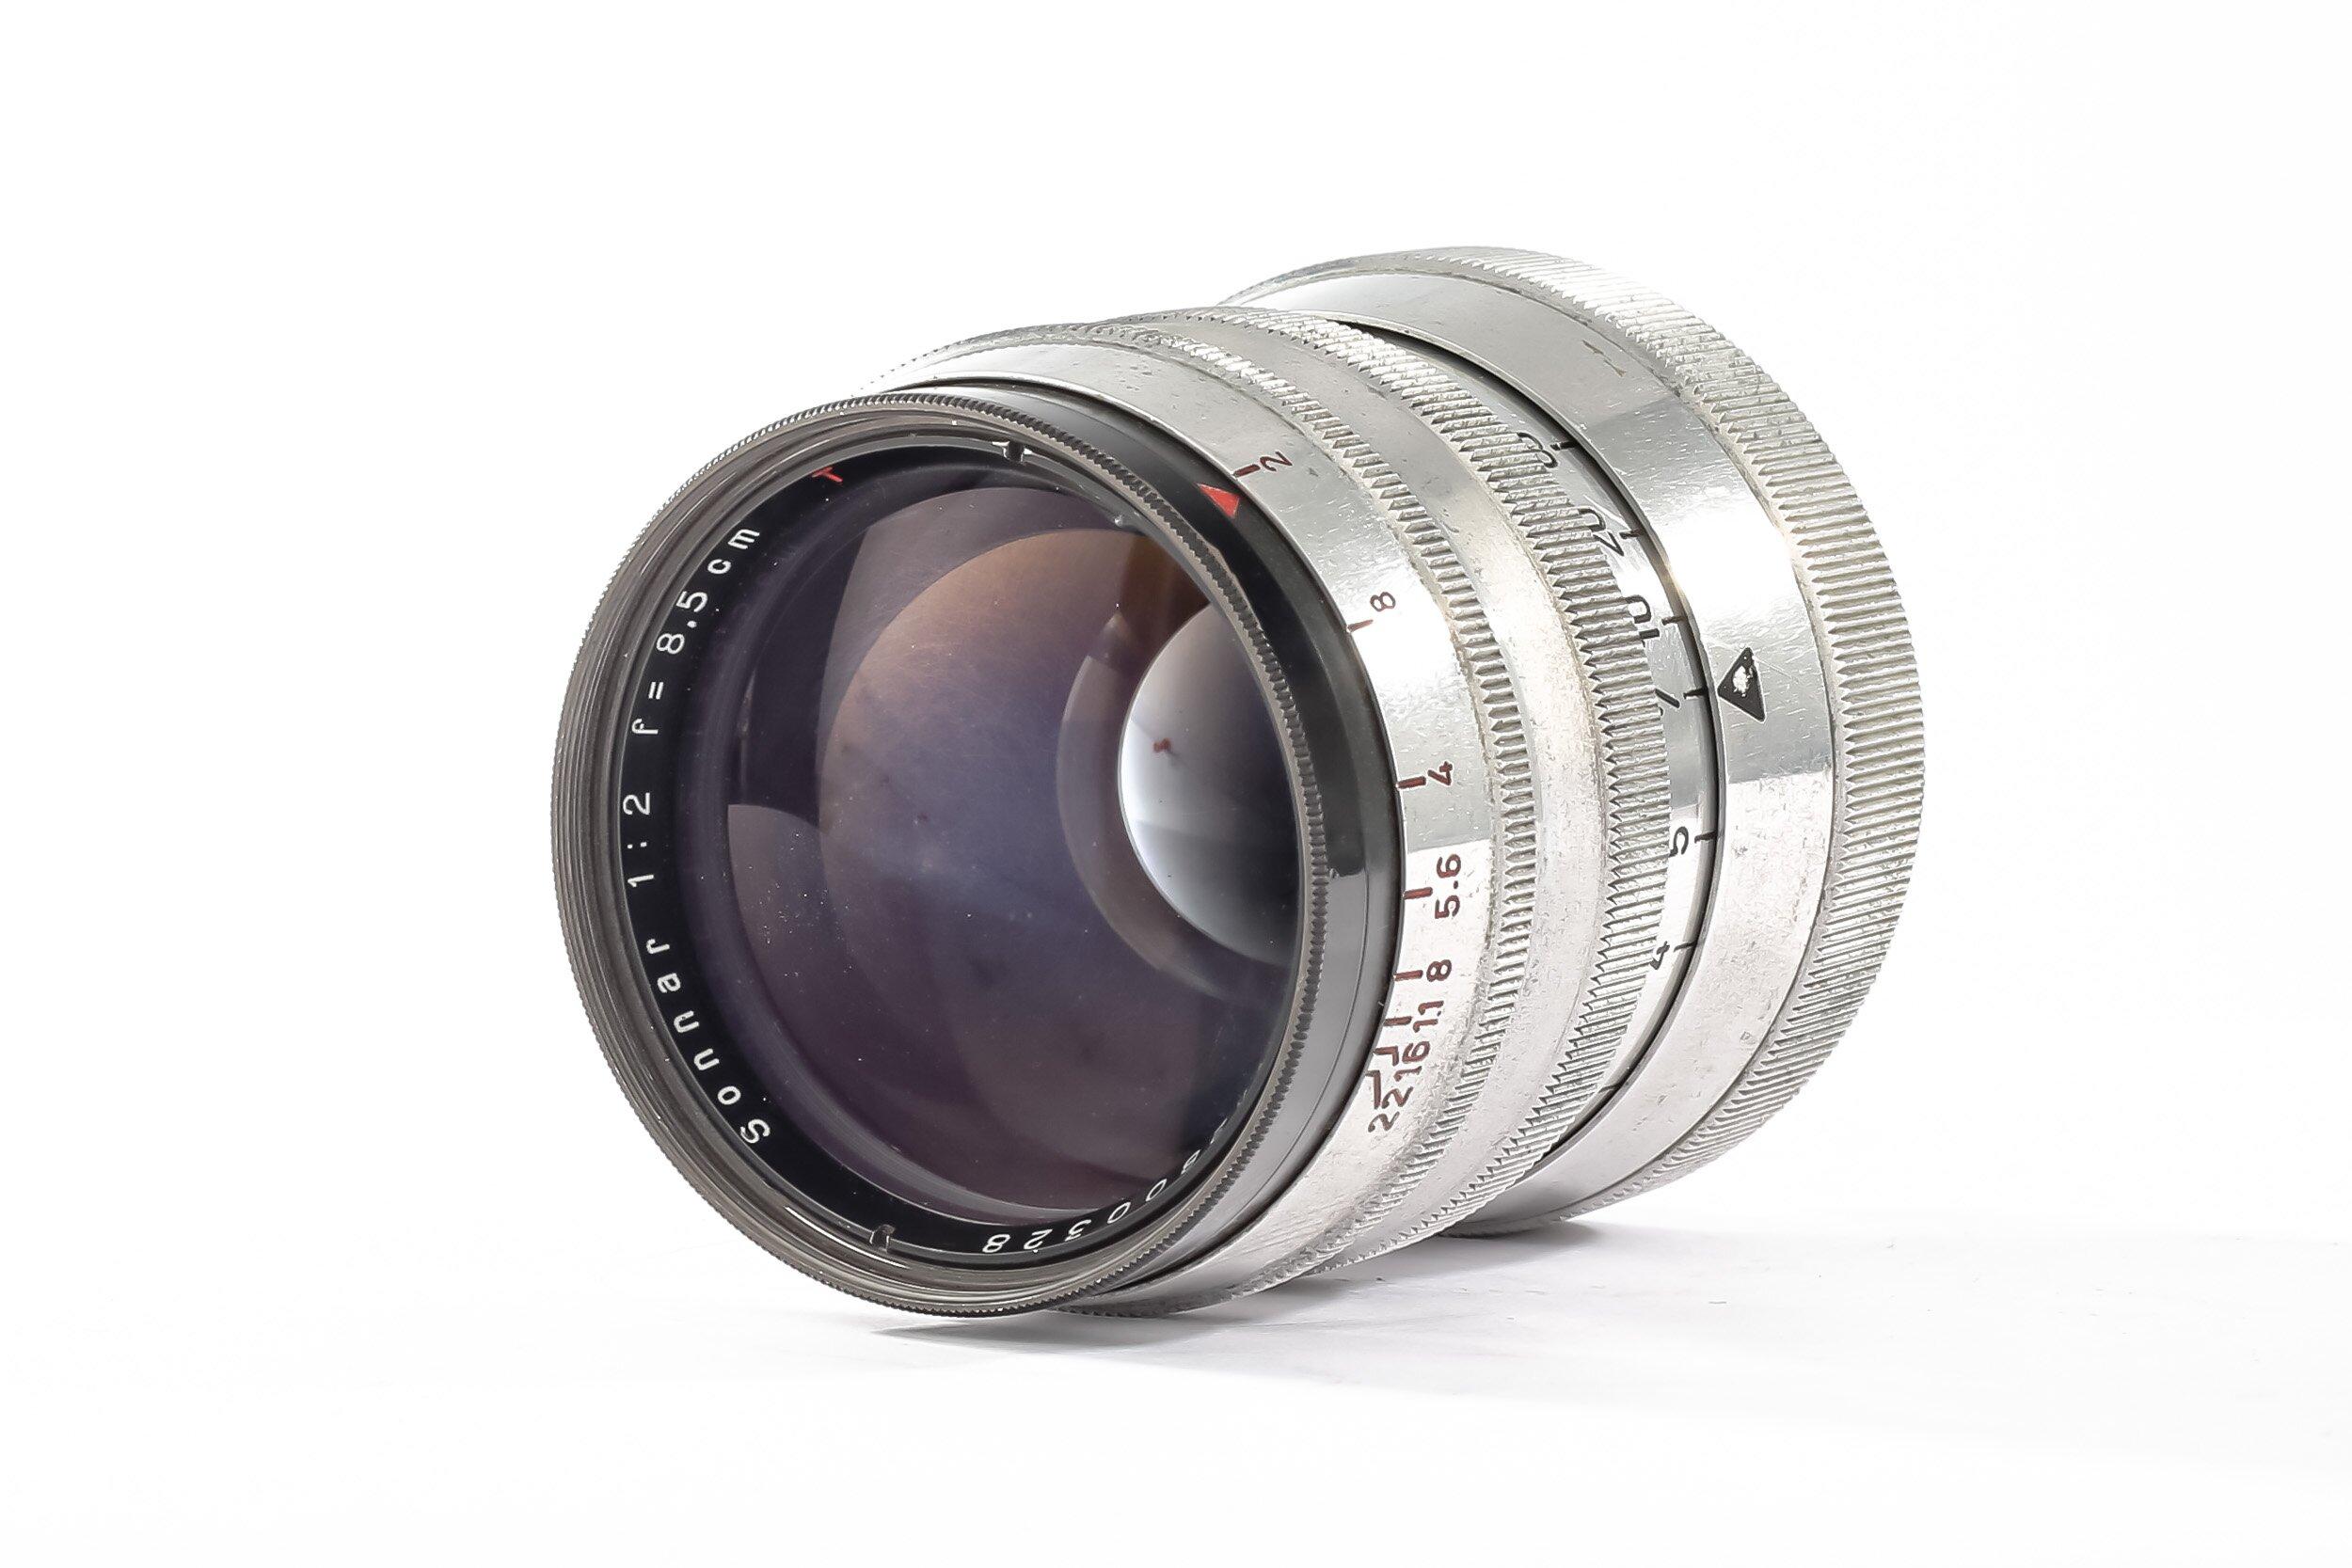 Carl Zeiss M39 Sonnar 2/8,5cm 85mm/2 T